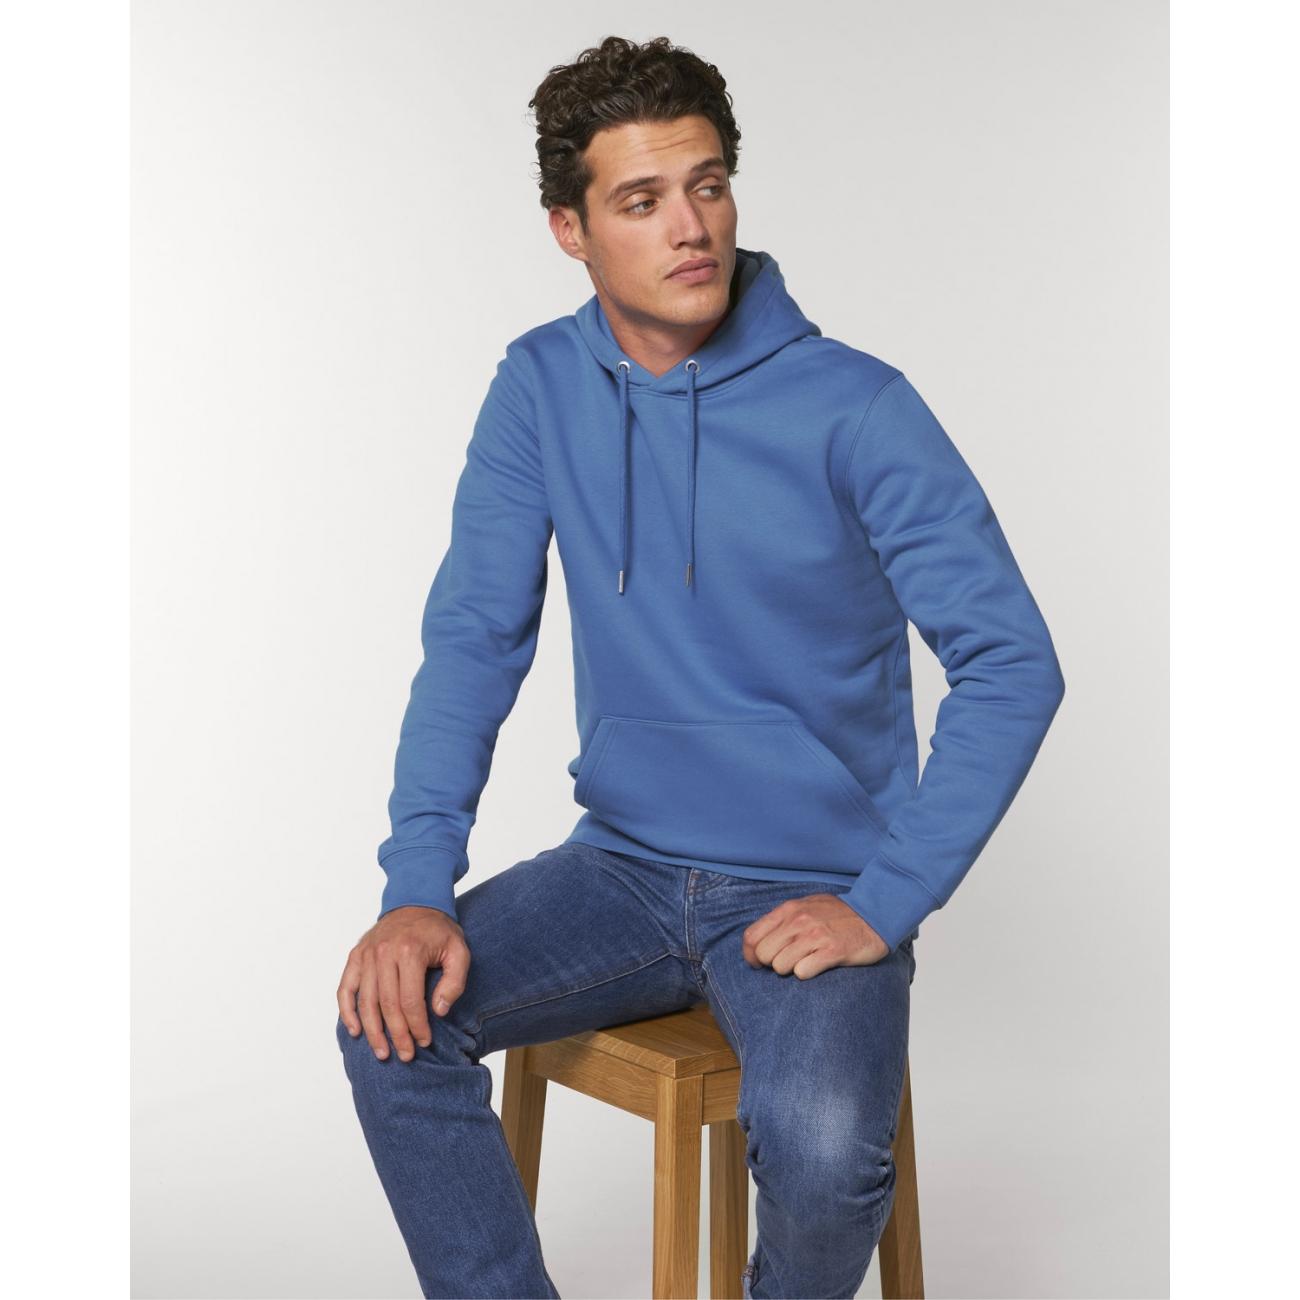 https://tee-shirt-bio.com/9867-thickbox_default/sweat-shirt-capuche-epais-et-interieur-doux-coton-bio-beau-bleu.jpg